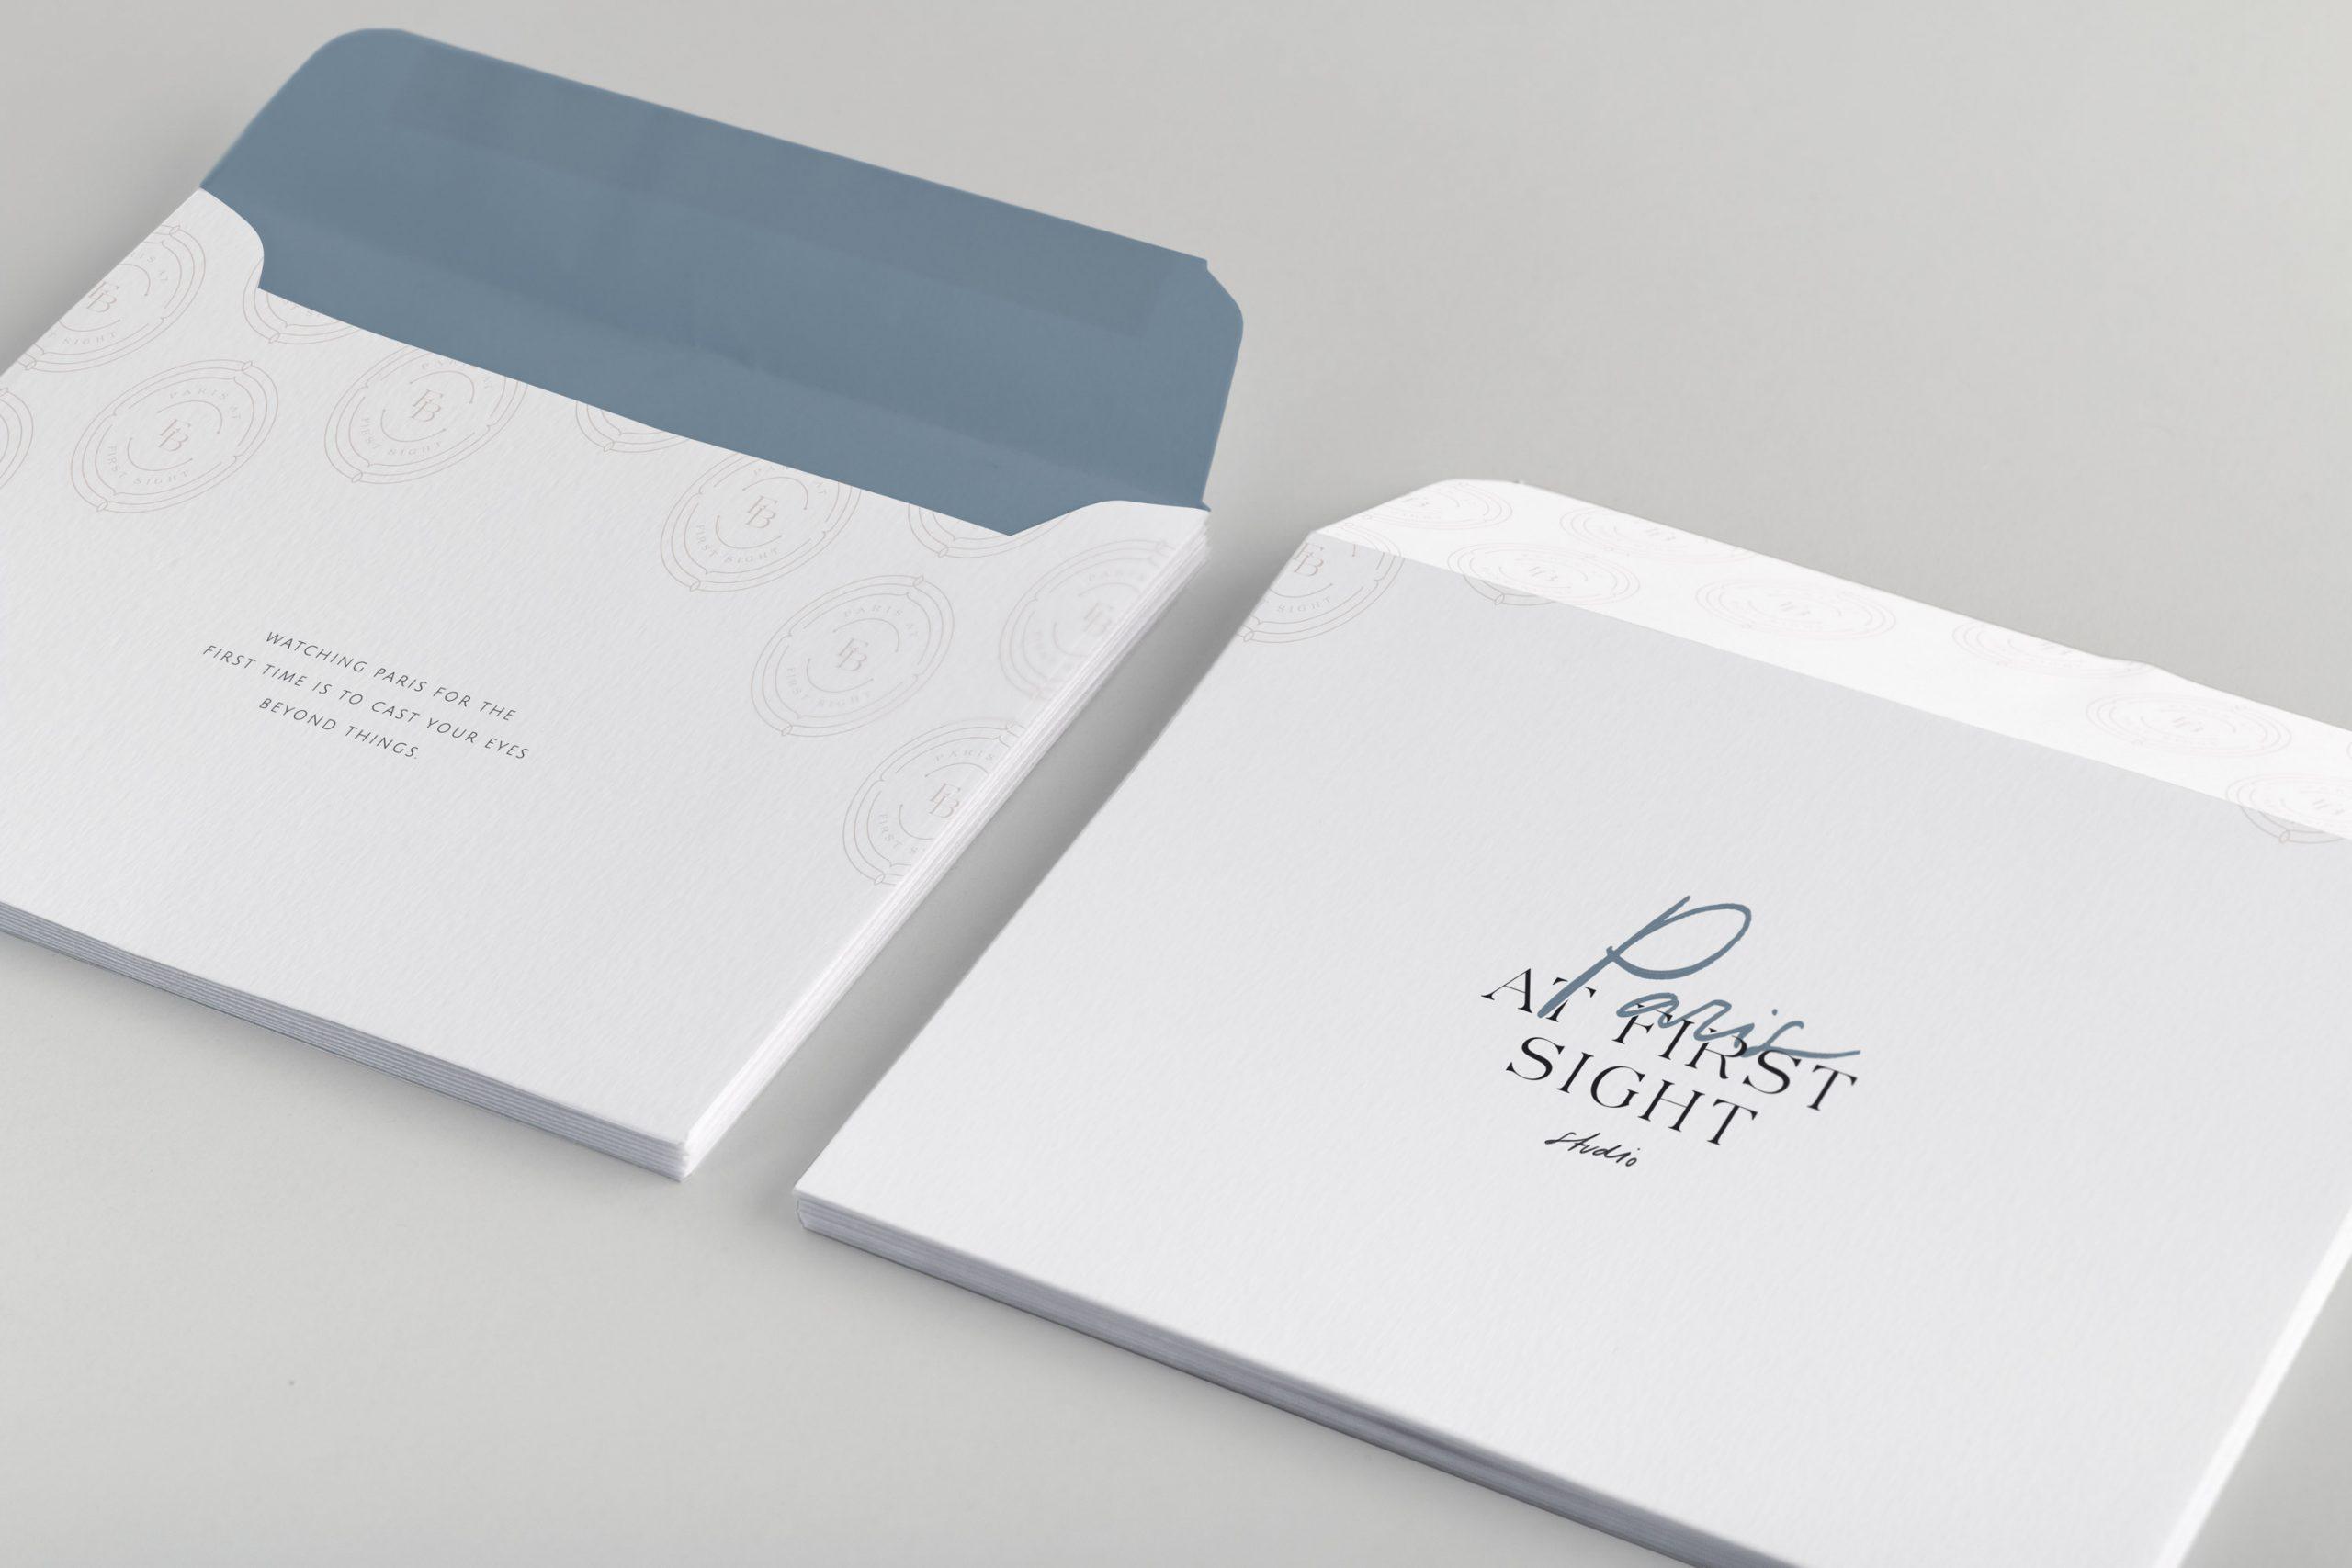 Miel Café Design Portfolio: Elegant Parisian stone blue mauve pink shipping envelopes product packaging design for Fine Art Photography business Paris At First Sight